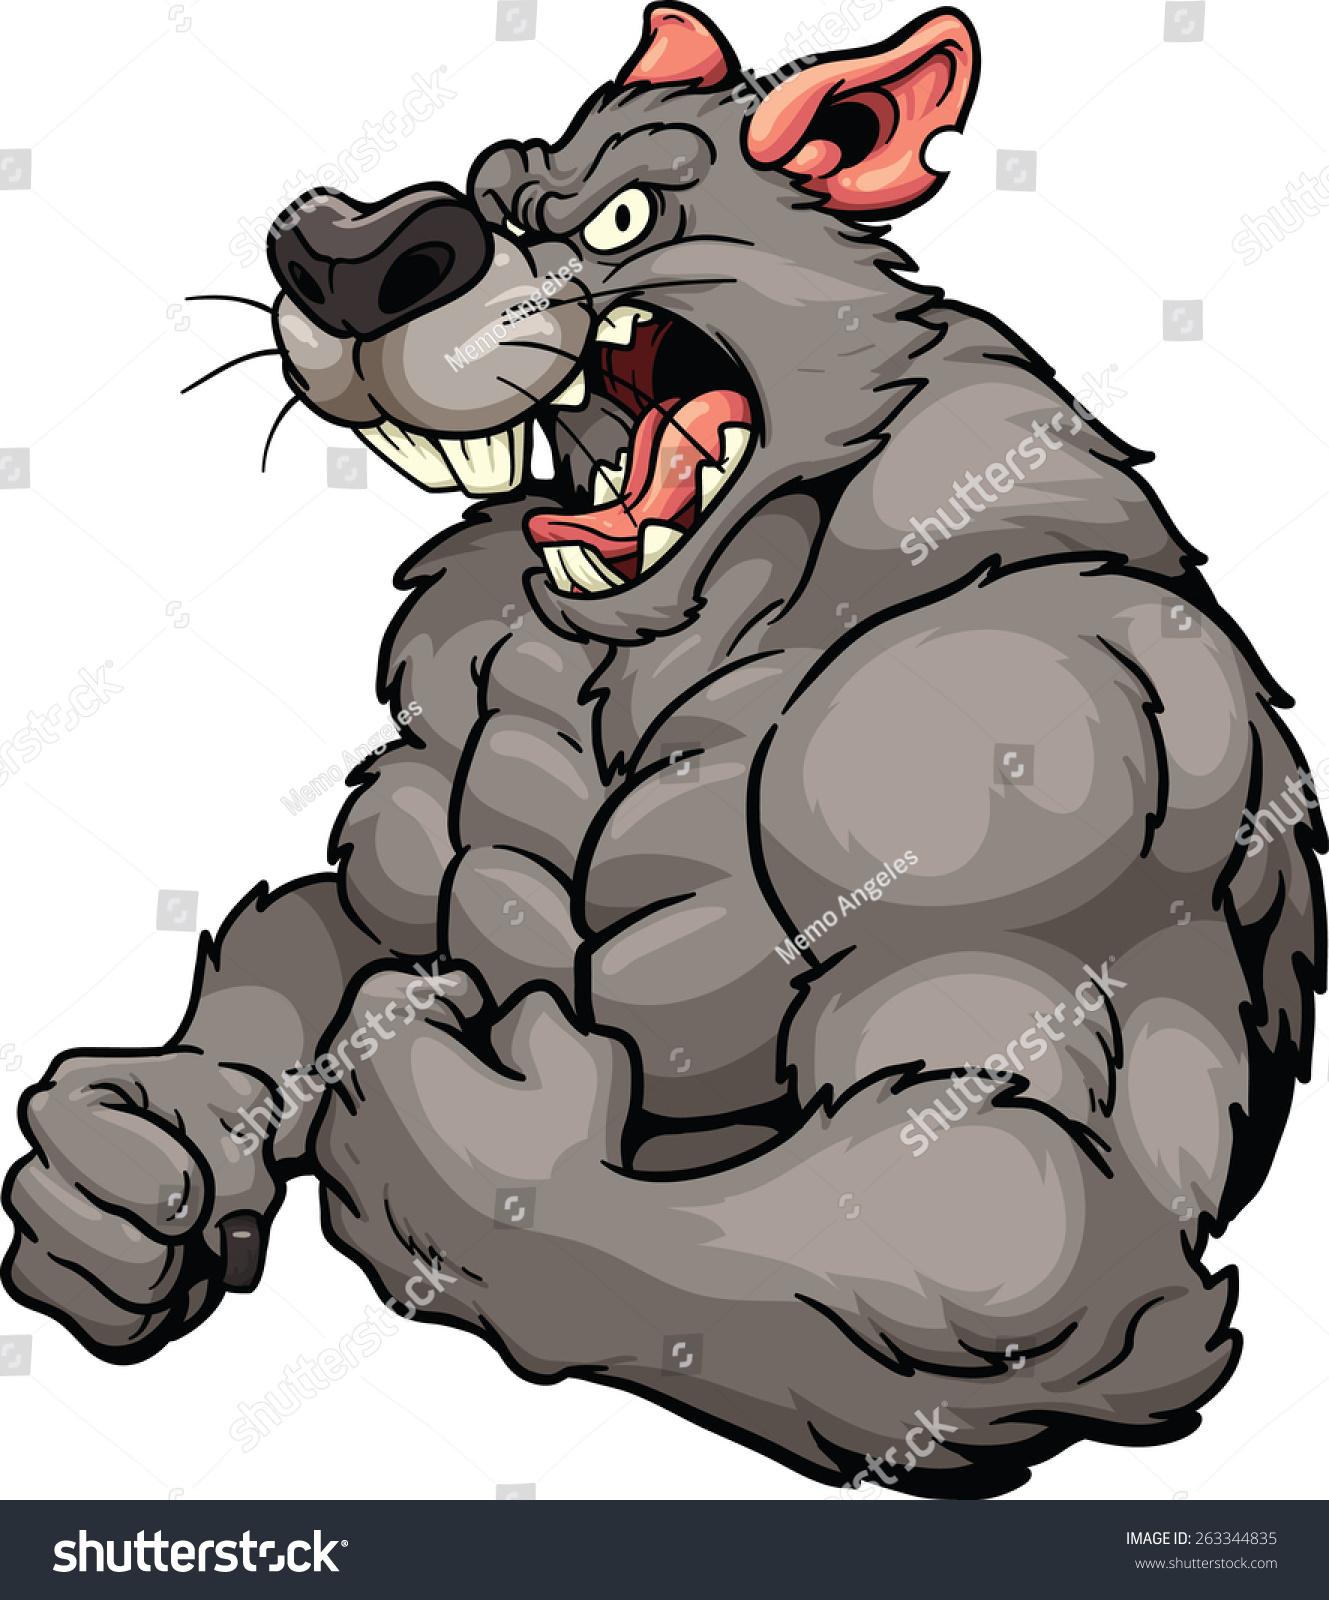 Angry Rat Mascot Vector Clip Art Stock Vector 263344835 - Shutterstock